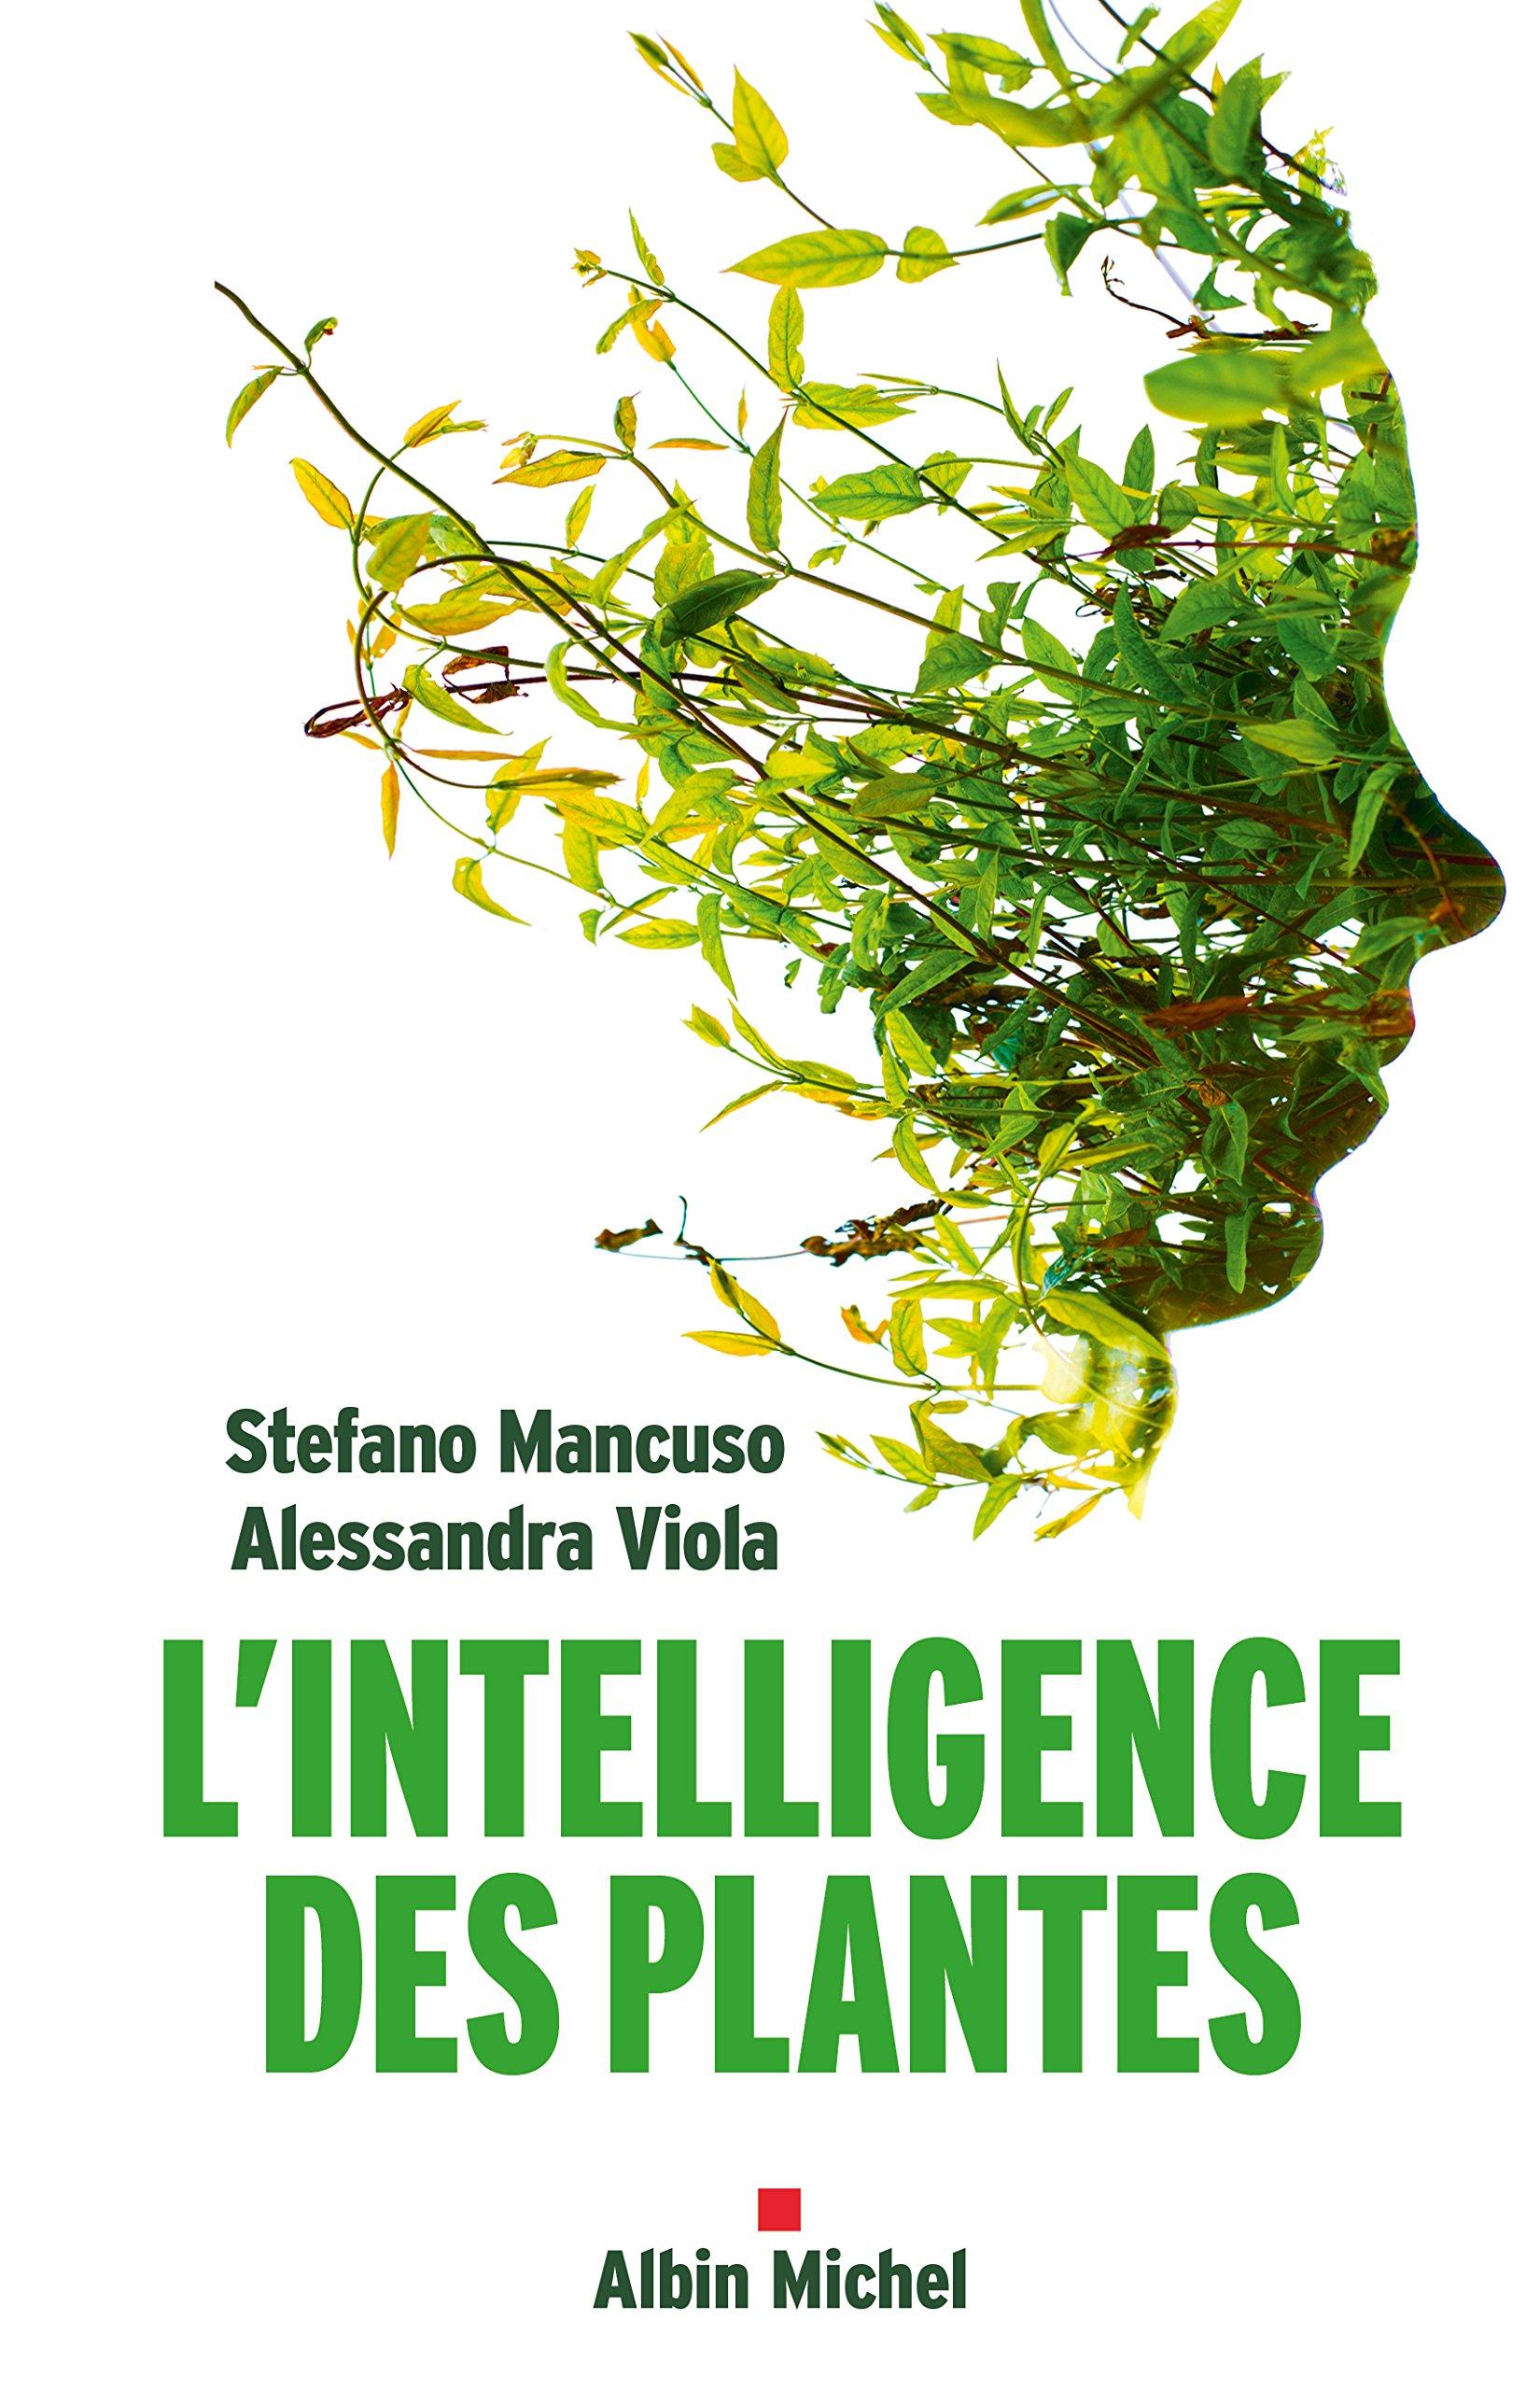 L'intelligence des plantes - Stefano Mancuso